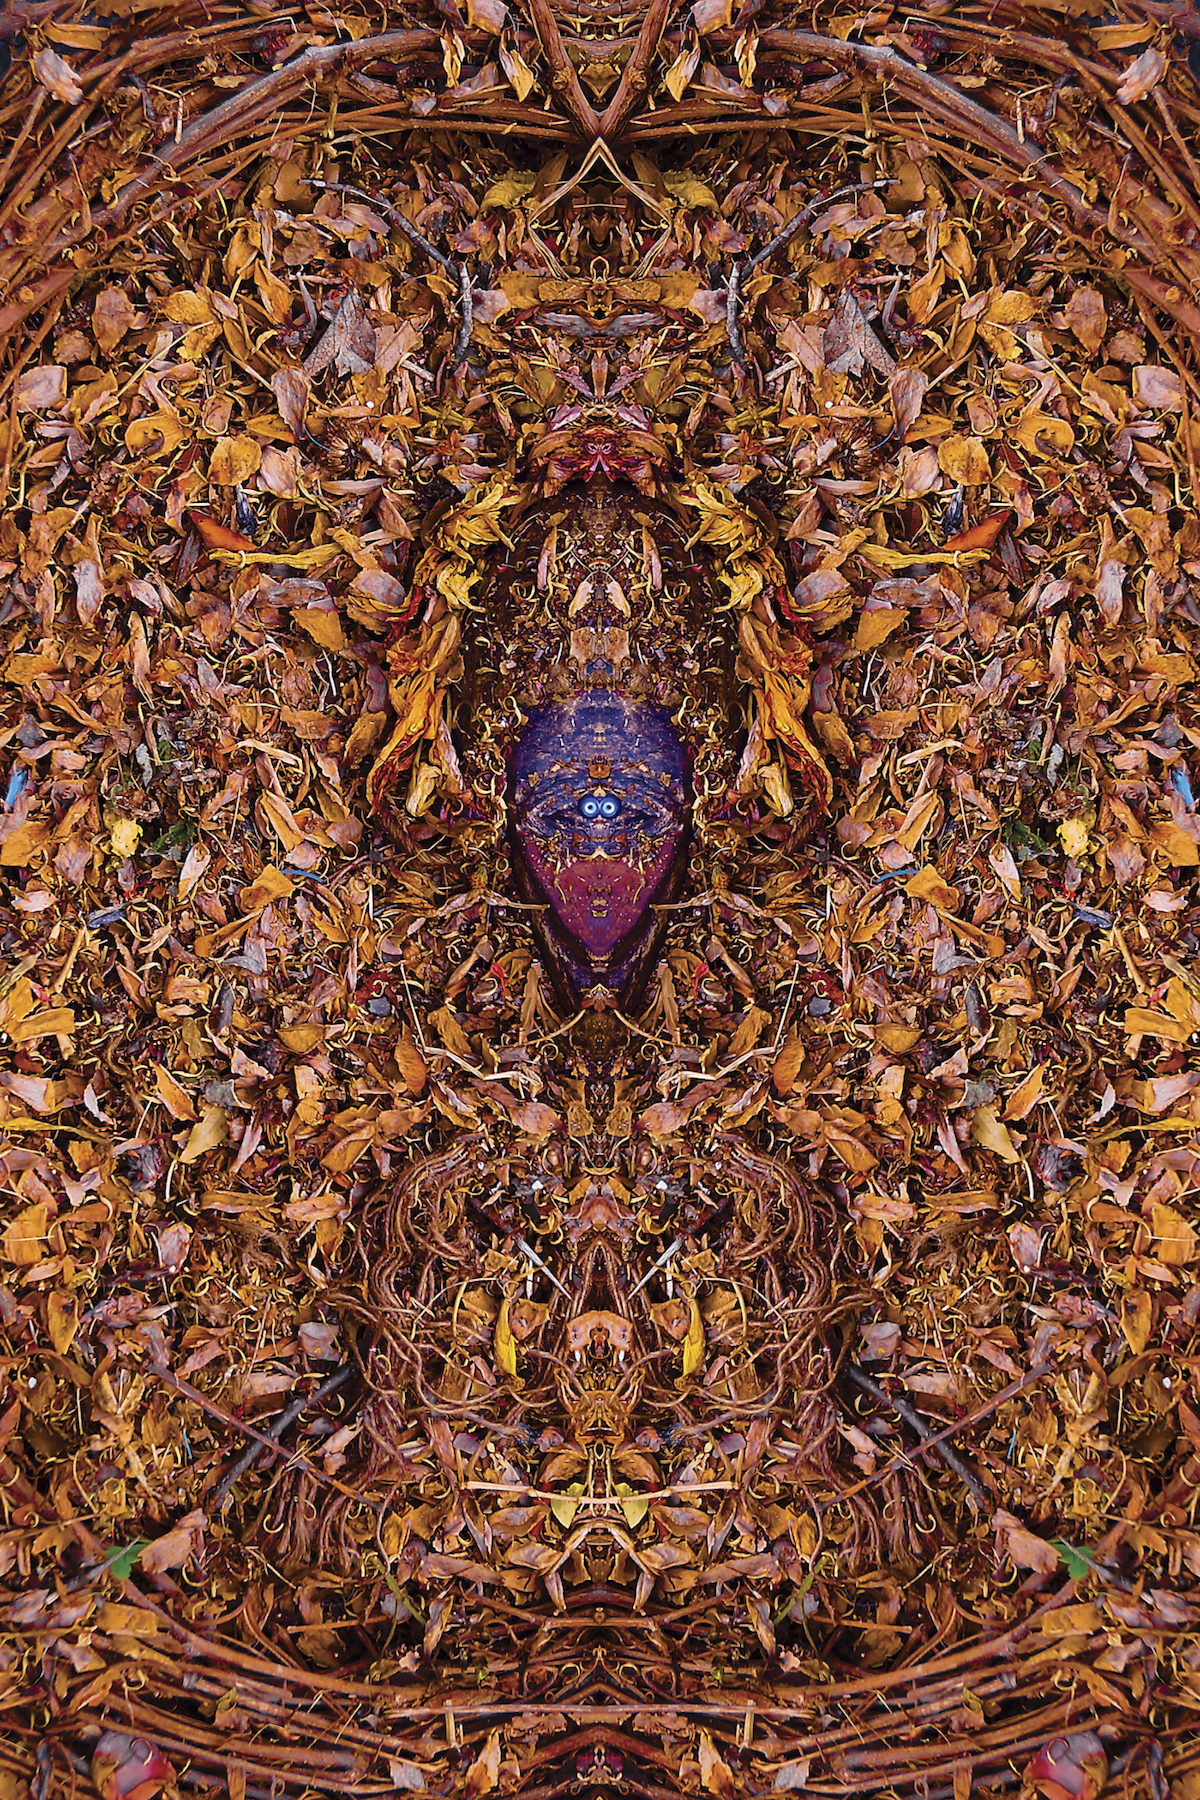 African Alchemy Totem #3 - Stephen Calhoun